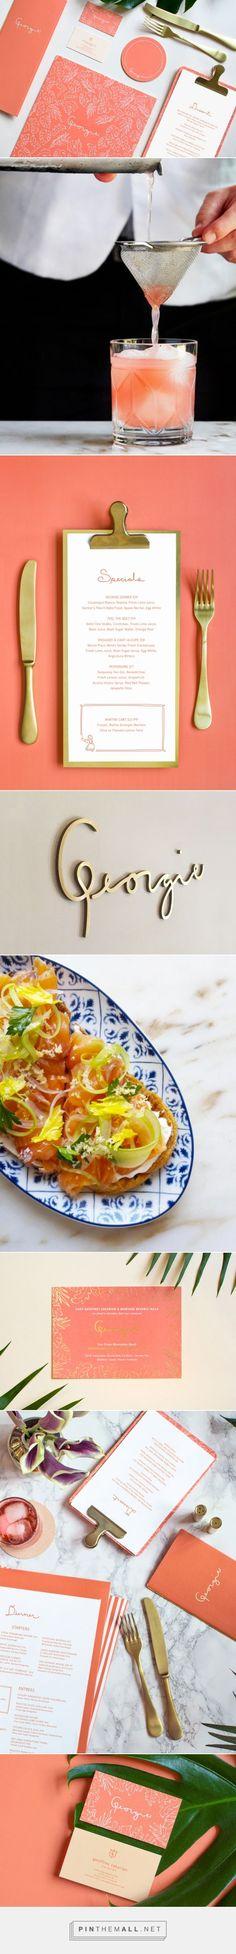 Georgie Restaurant Branding and Menu Design by Sandy Ley | Fivestar Branding Agency – Design and Branding Agency & Curated Inspiration Gallery